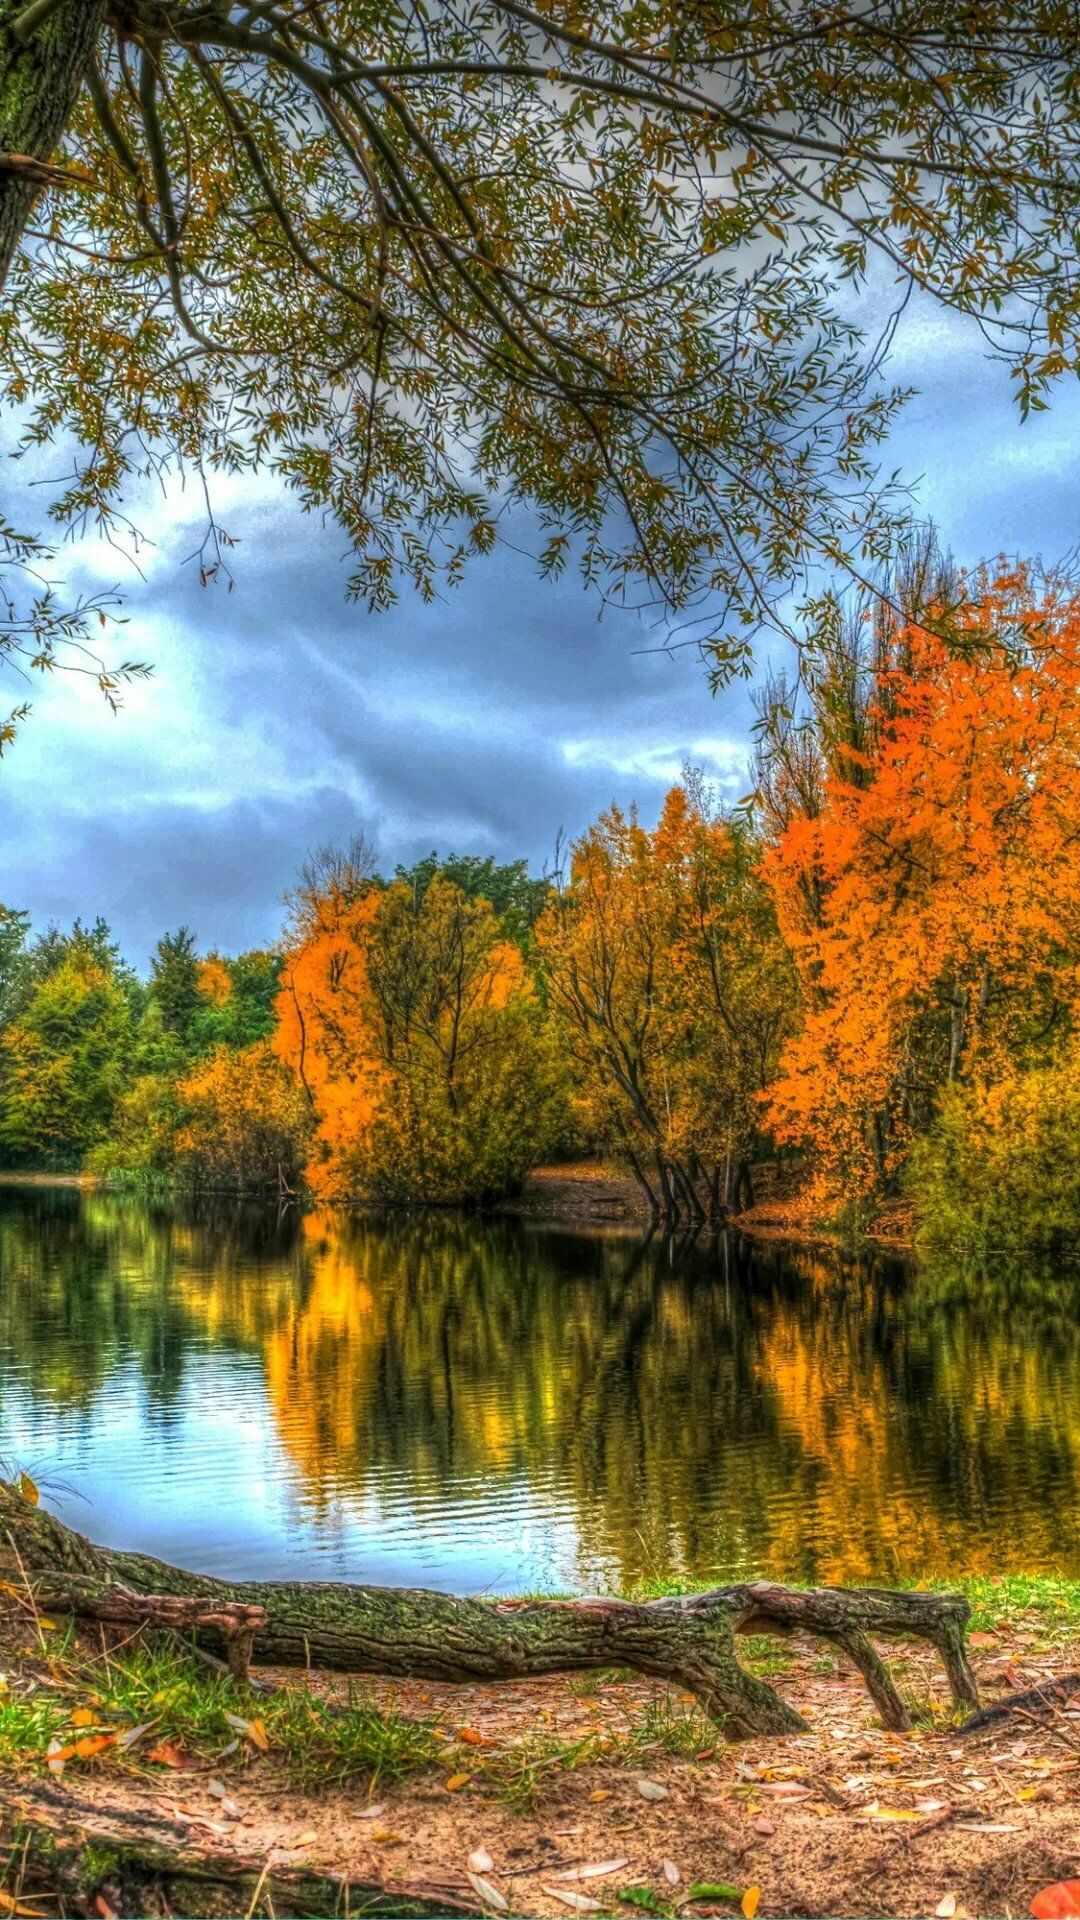 Autumn Landscape Photos High Resolution